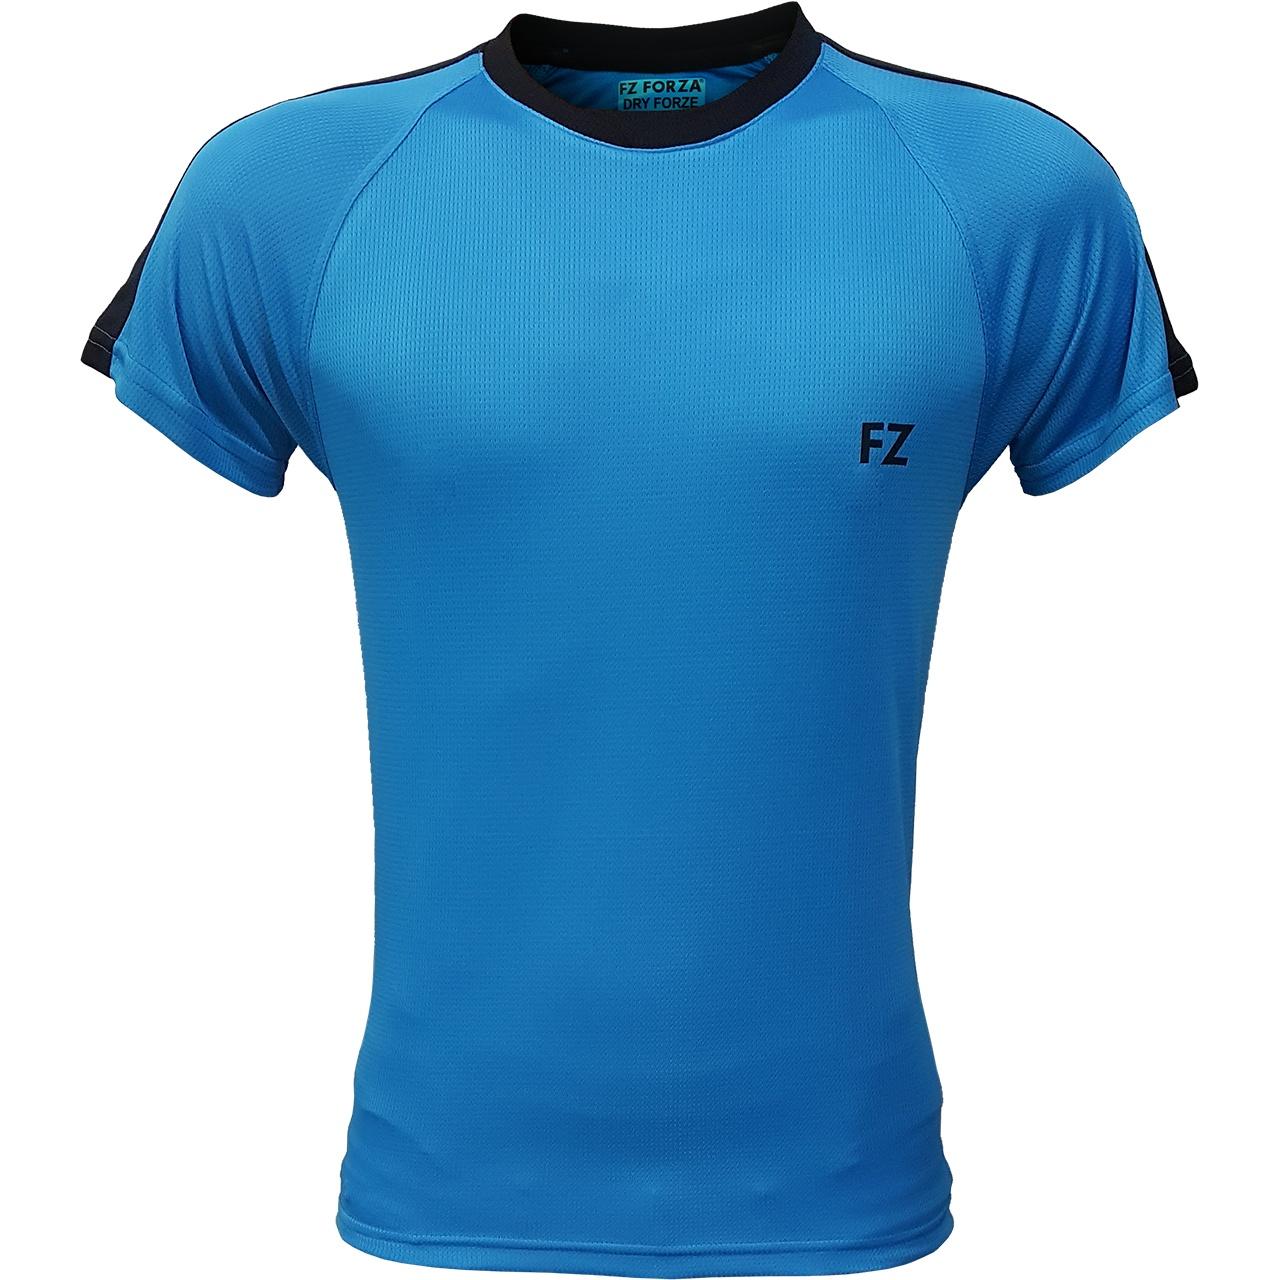 تیشرت ورزشی اف زد فورزا مدل Line کد 04 رنگ آبی کم رنگ